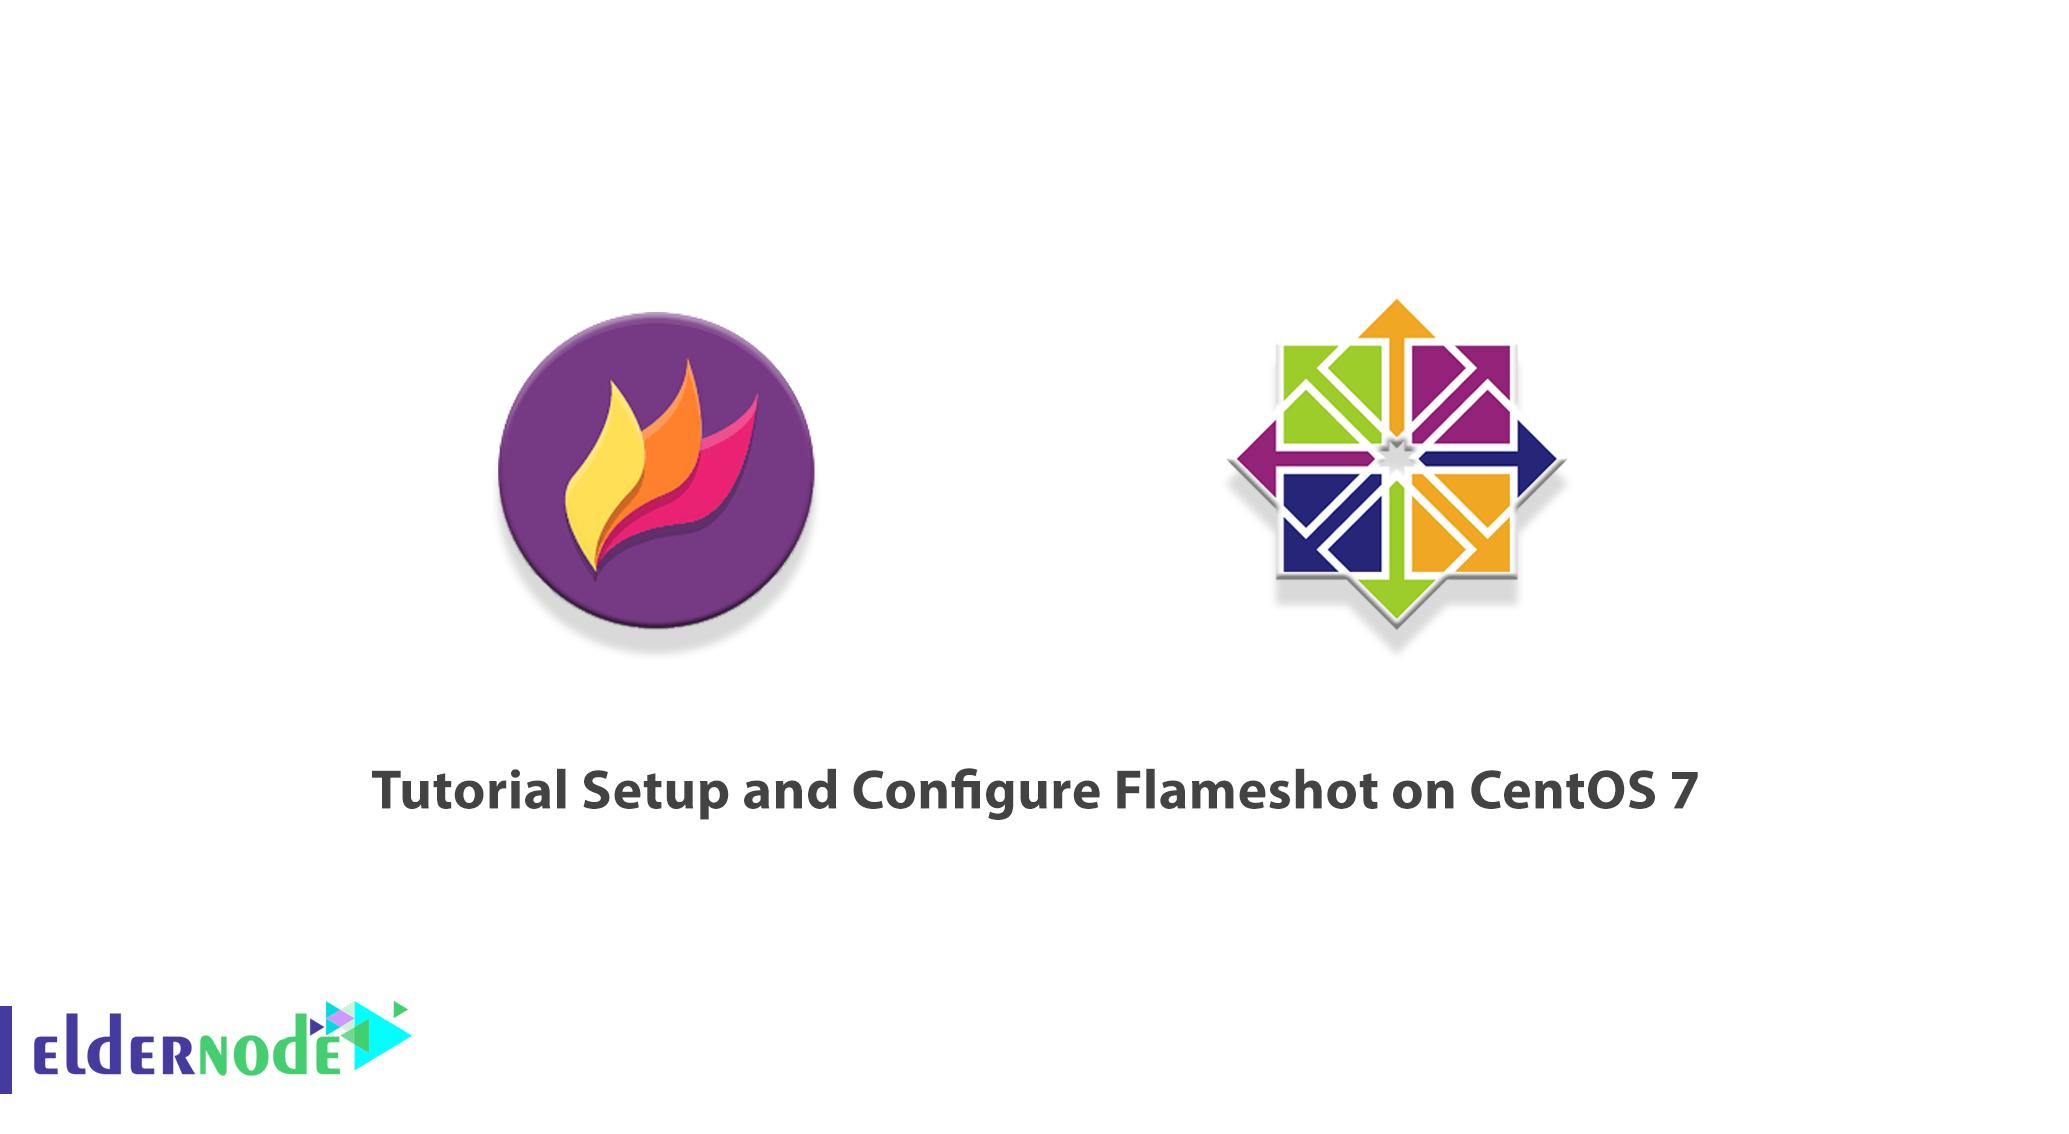 Tutorial Setup and Configure Flameshot on CentOS 7